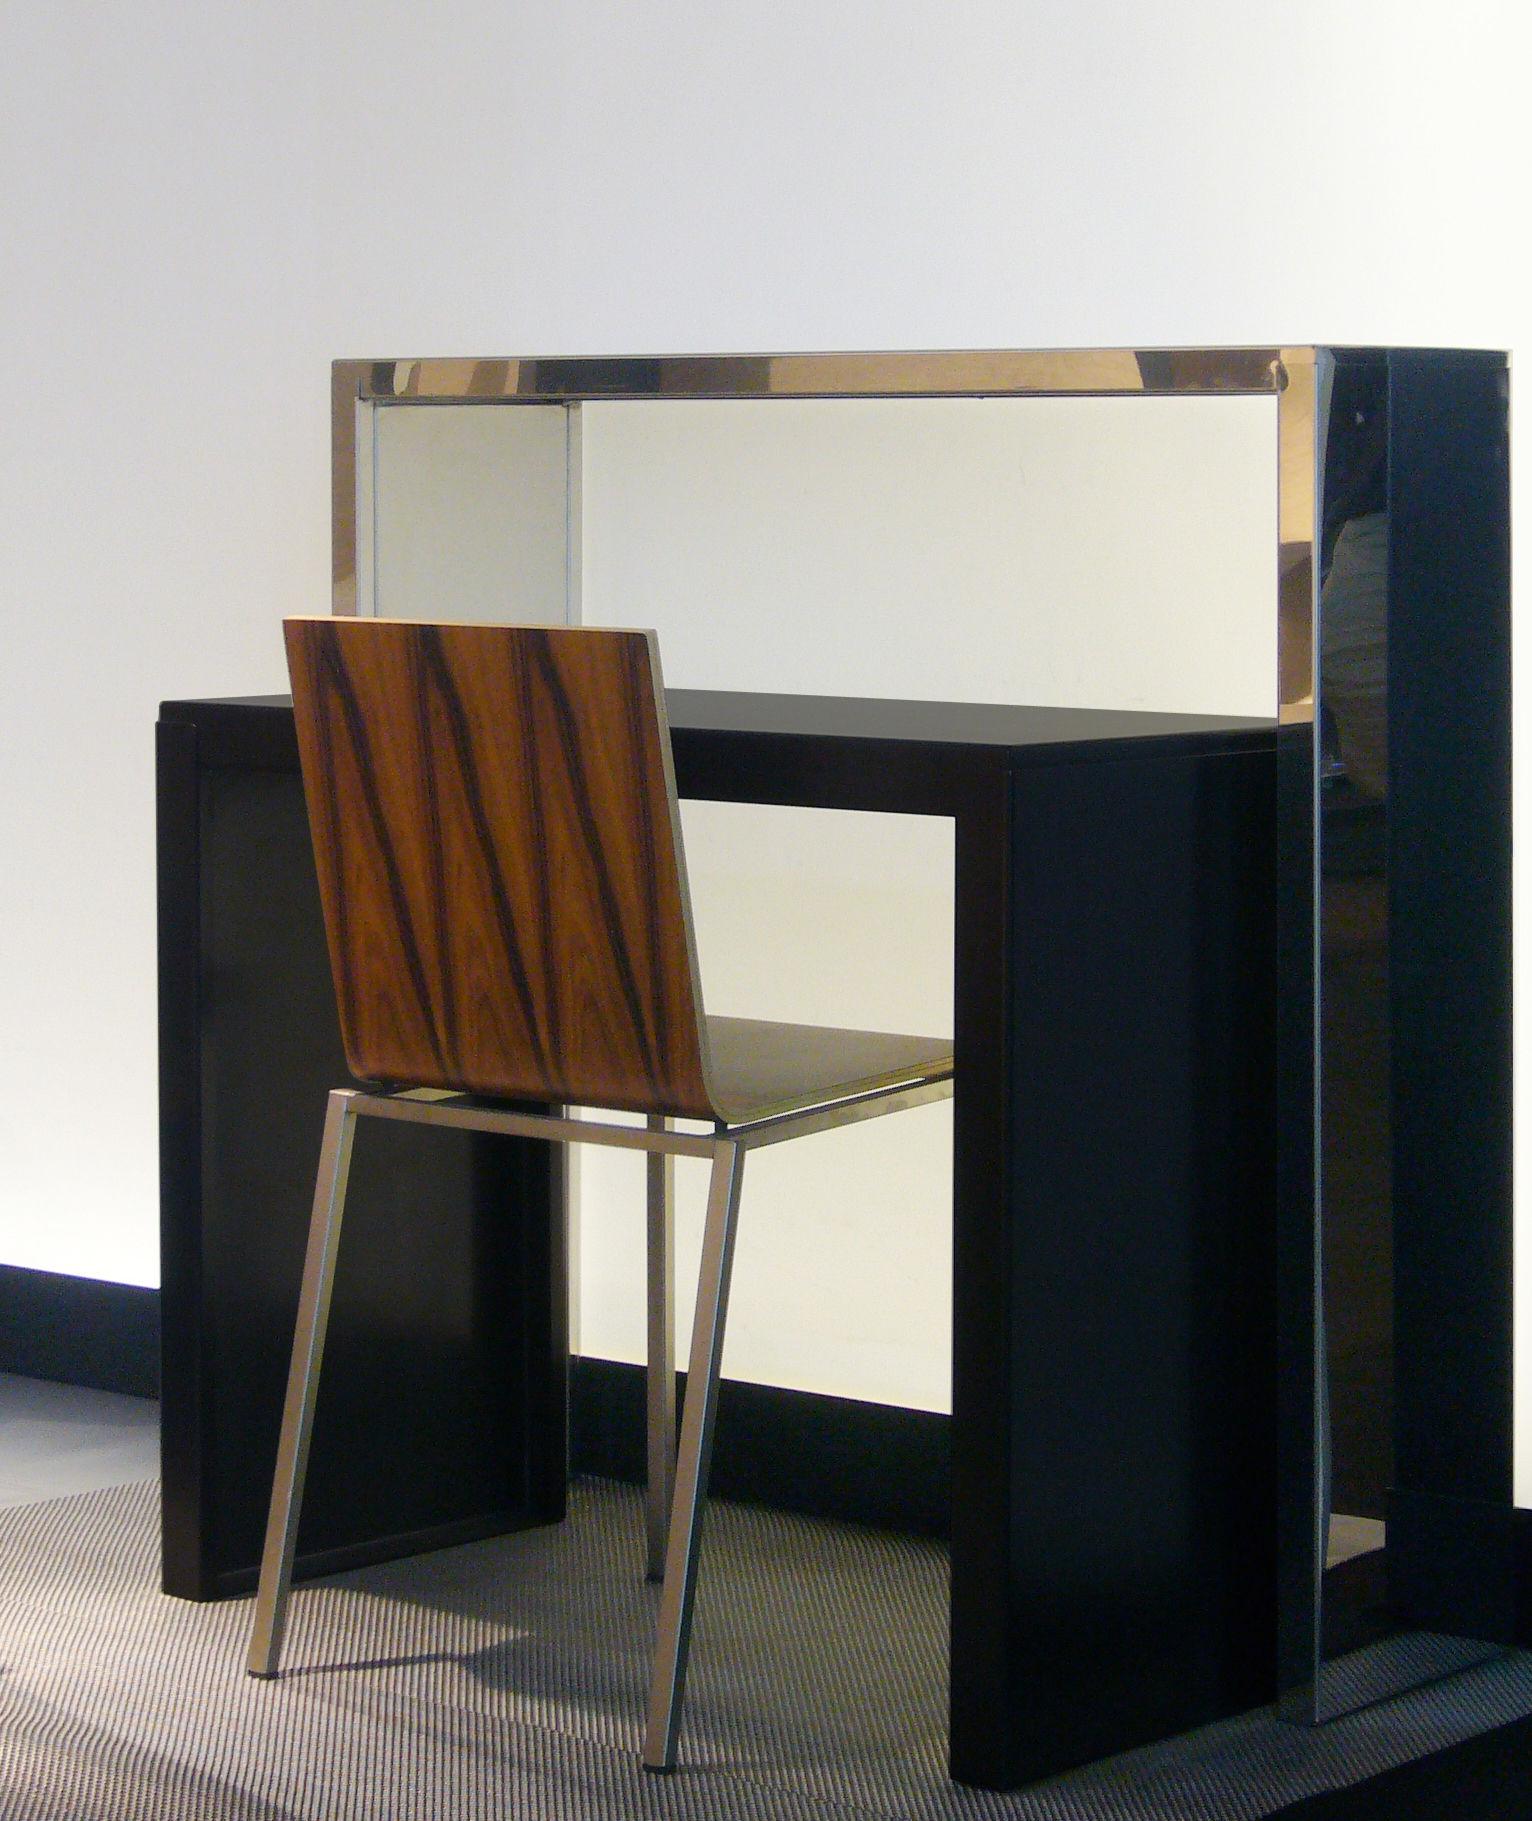 console inox high console miroir l 100 x prof 28 x h 100 cm zeus. Black Bedroom Furniture Sets. Home Design Ideas